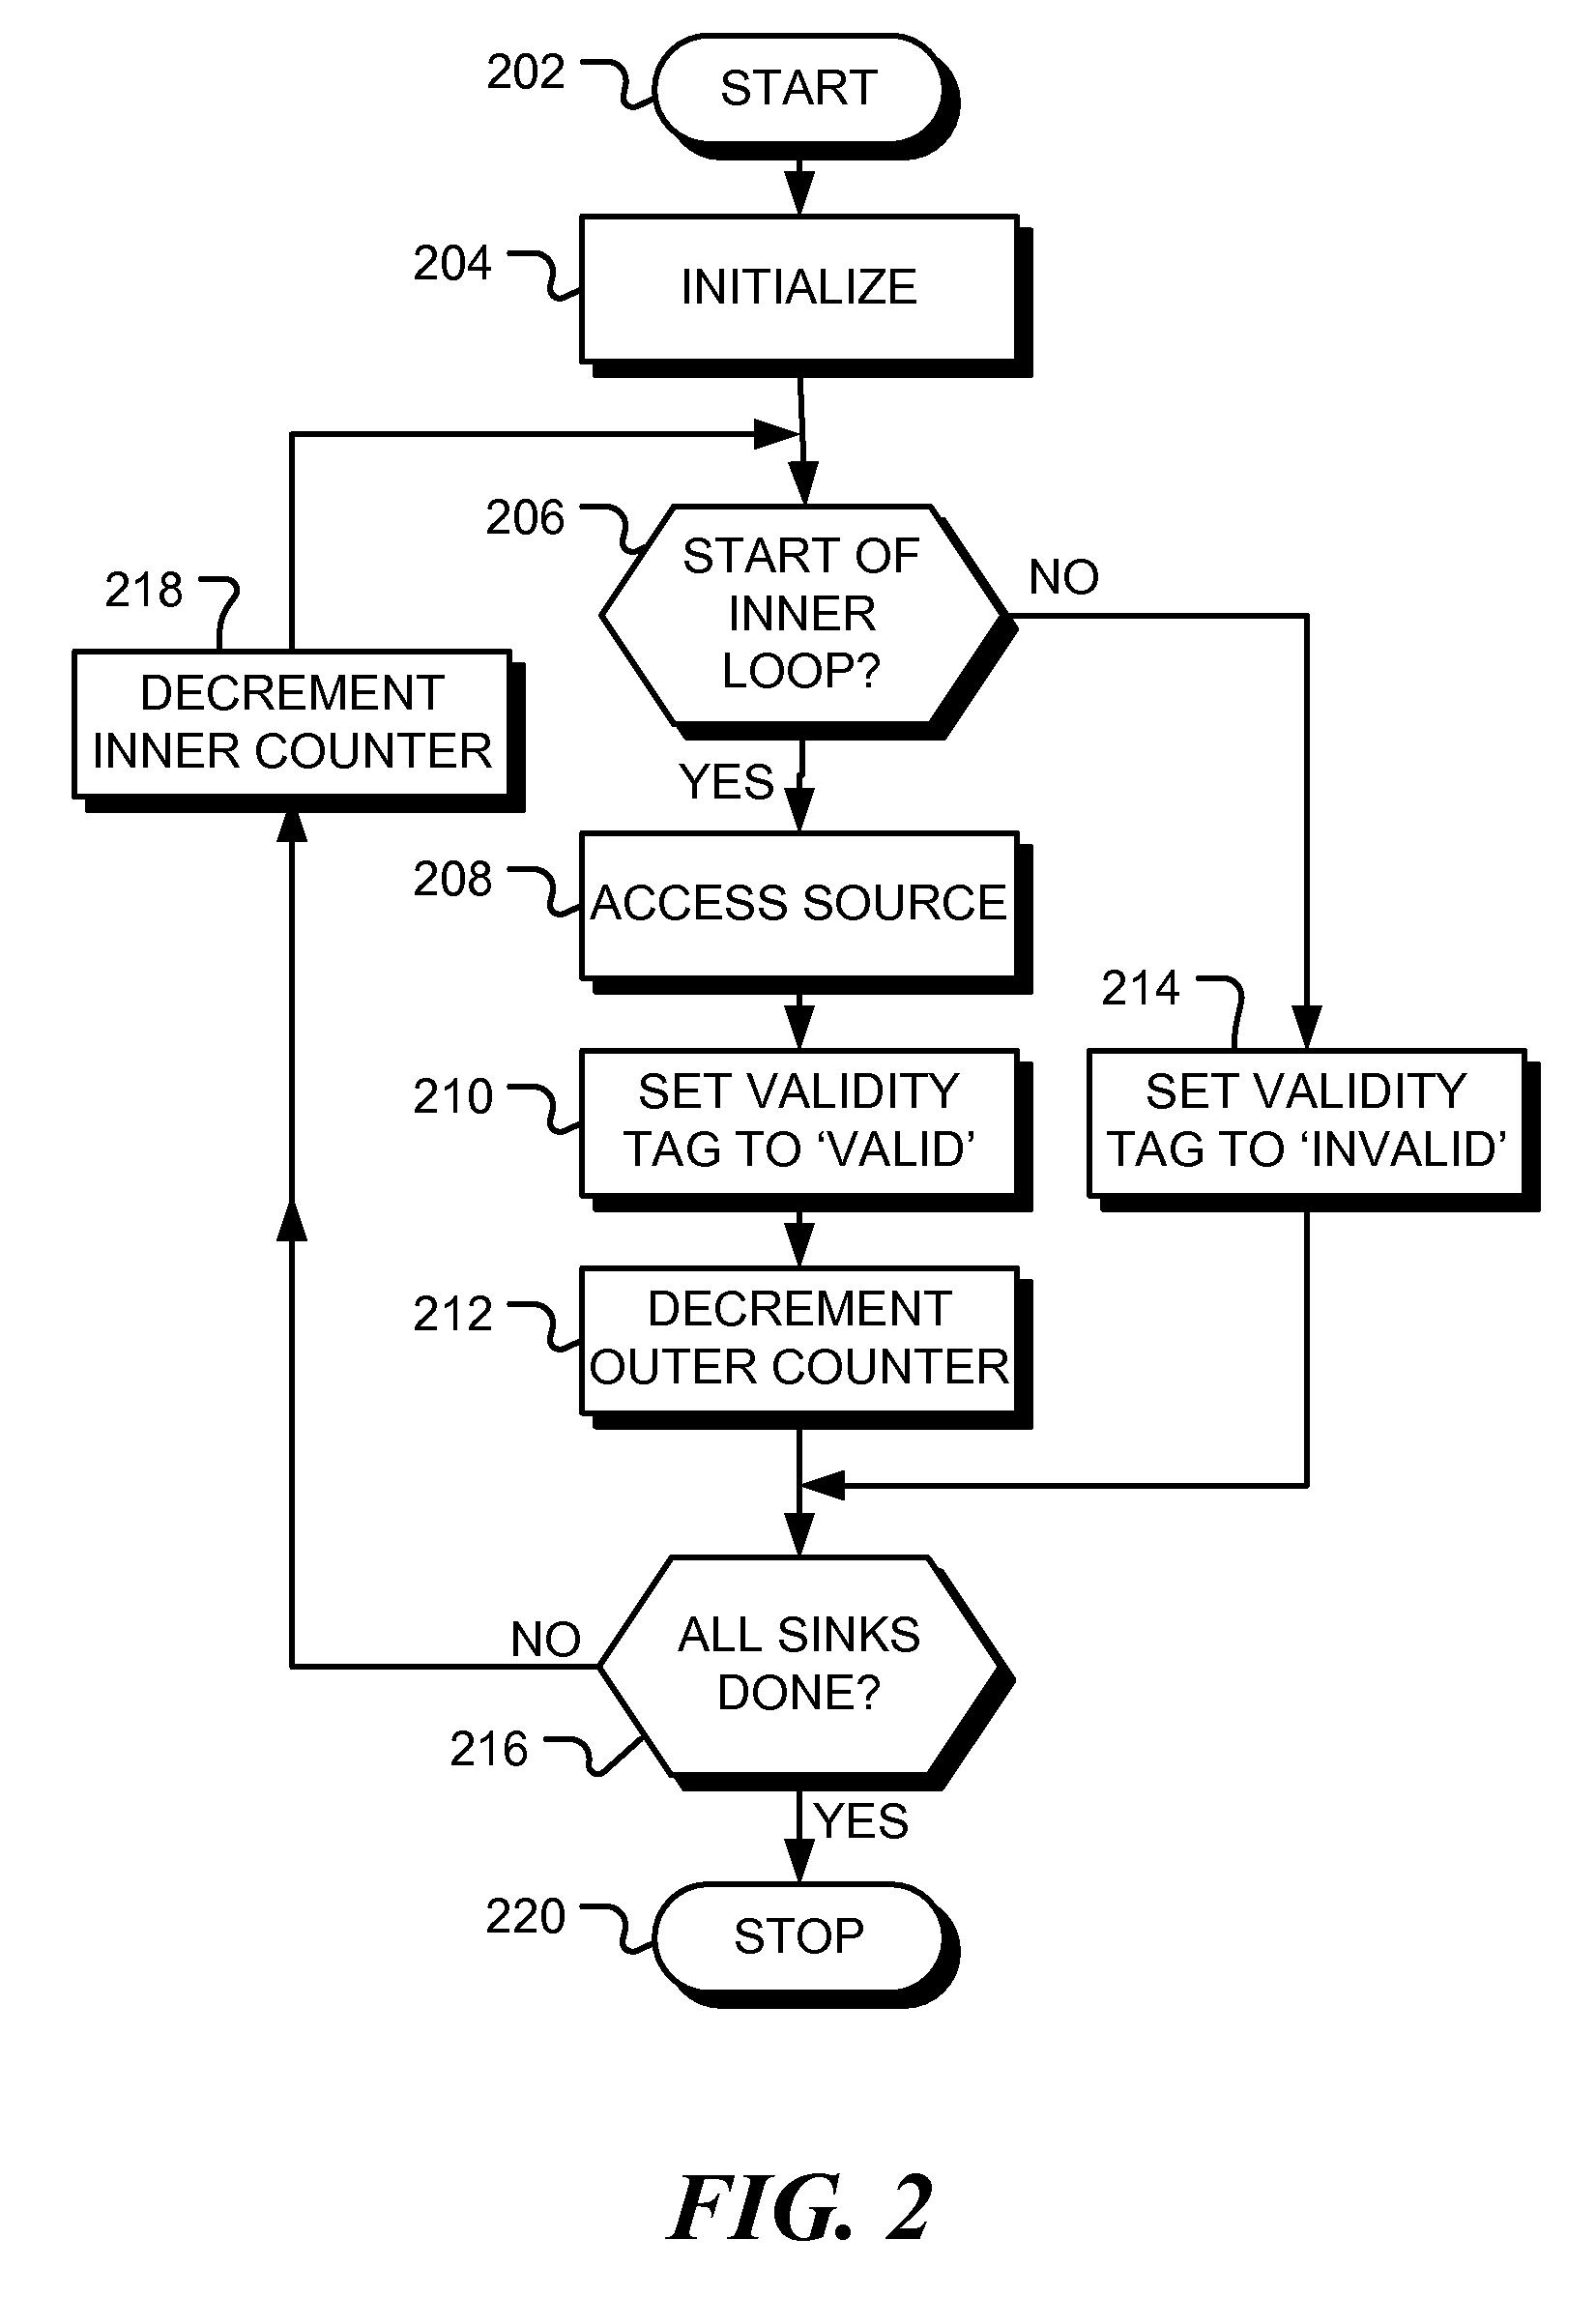 Flowchart nested loop flowchart in word for loop patent drawing nested loop flowchart geenschuldenfo Choice Image